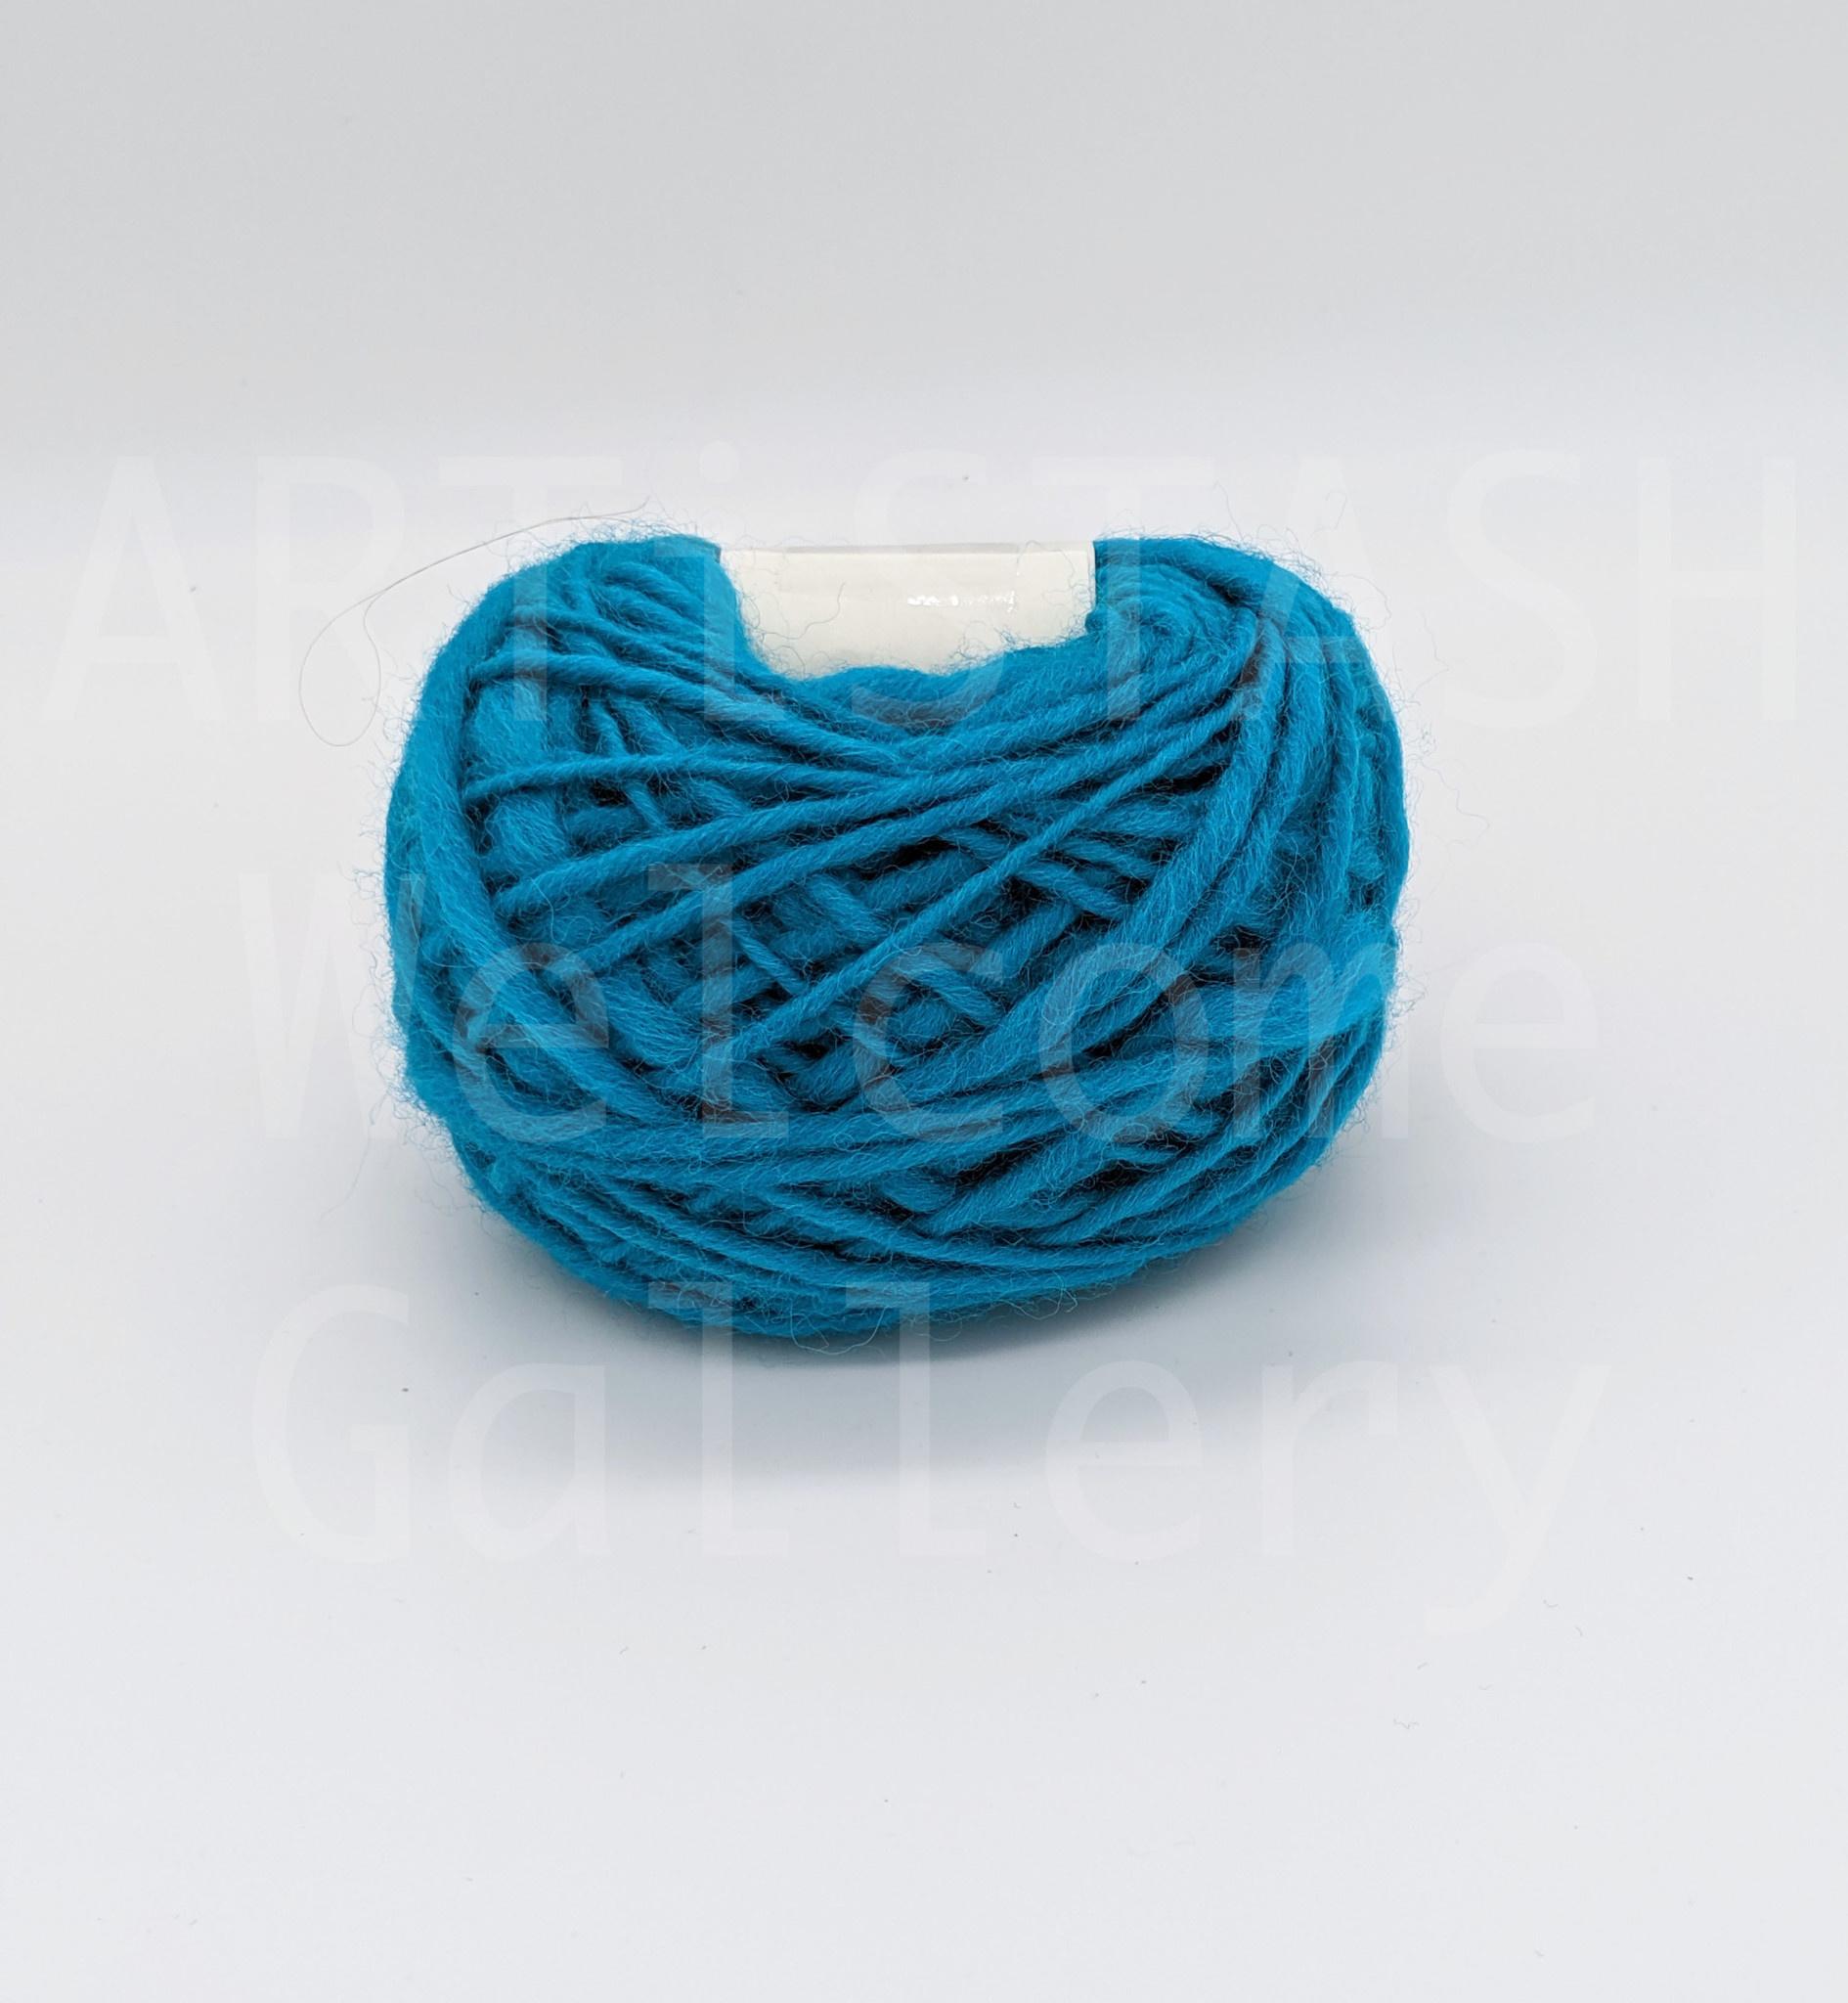 Just Sabine Hand Spun Yarn, Desert Turquoise, 25 Yards